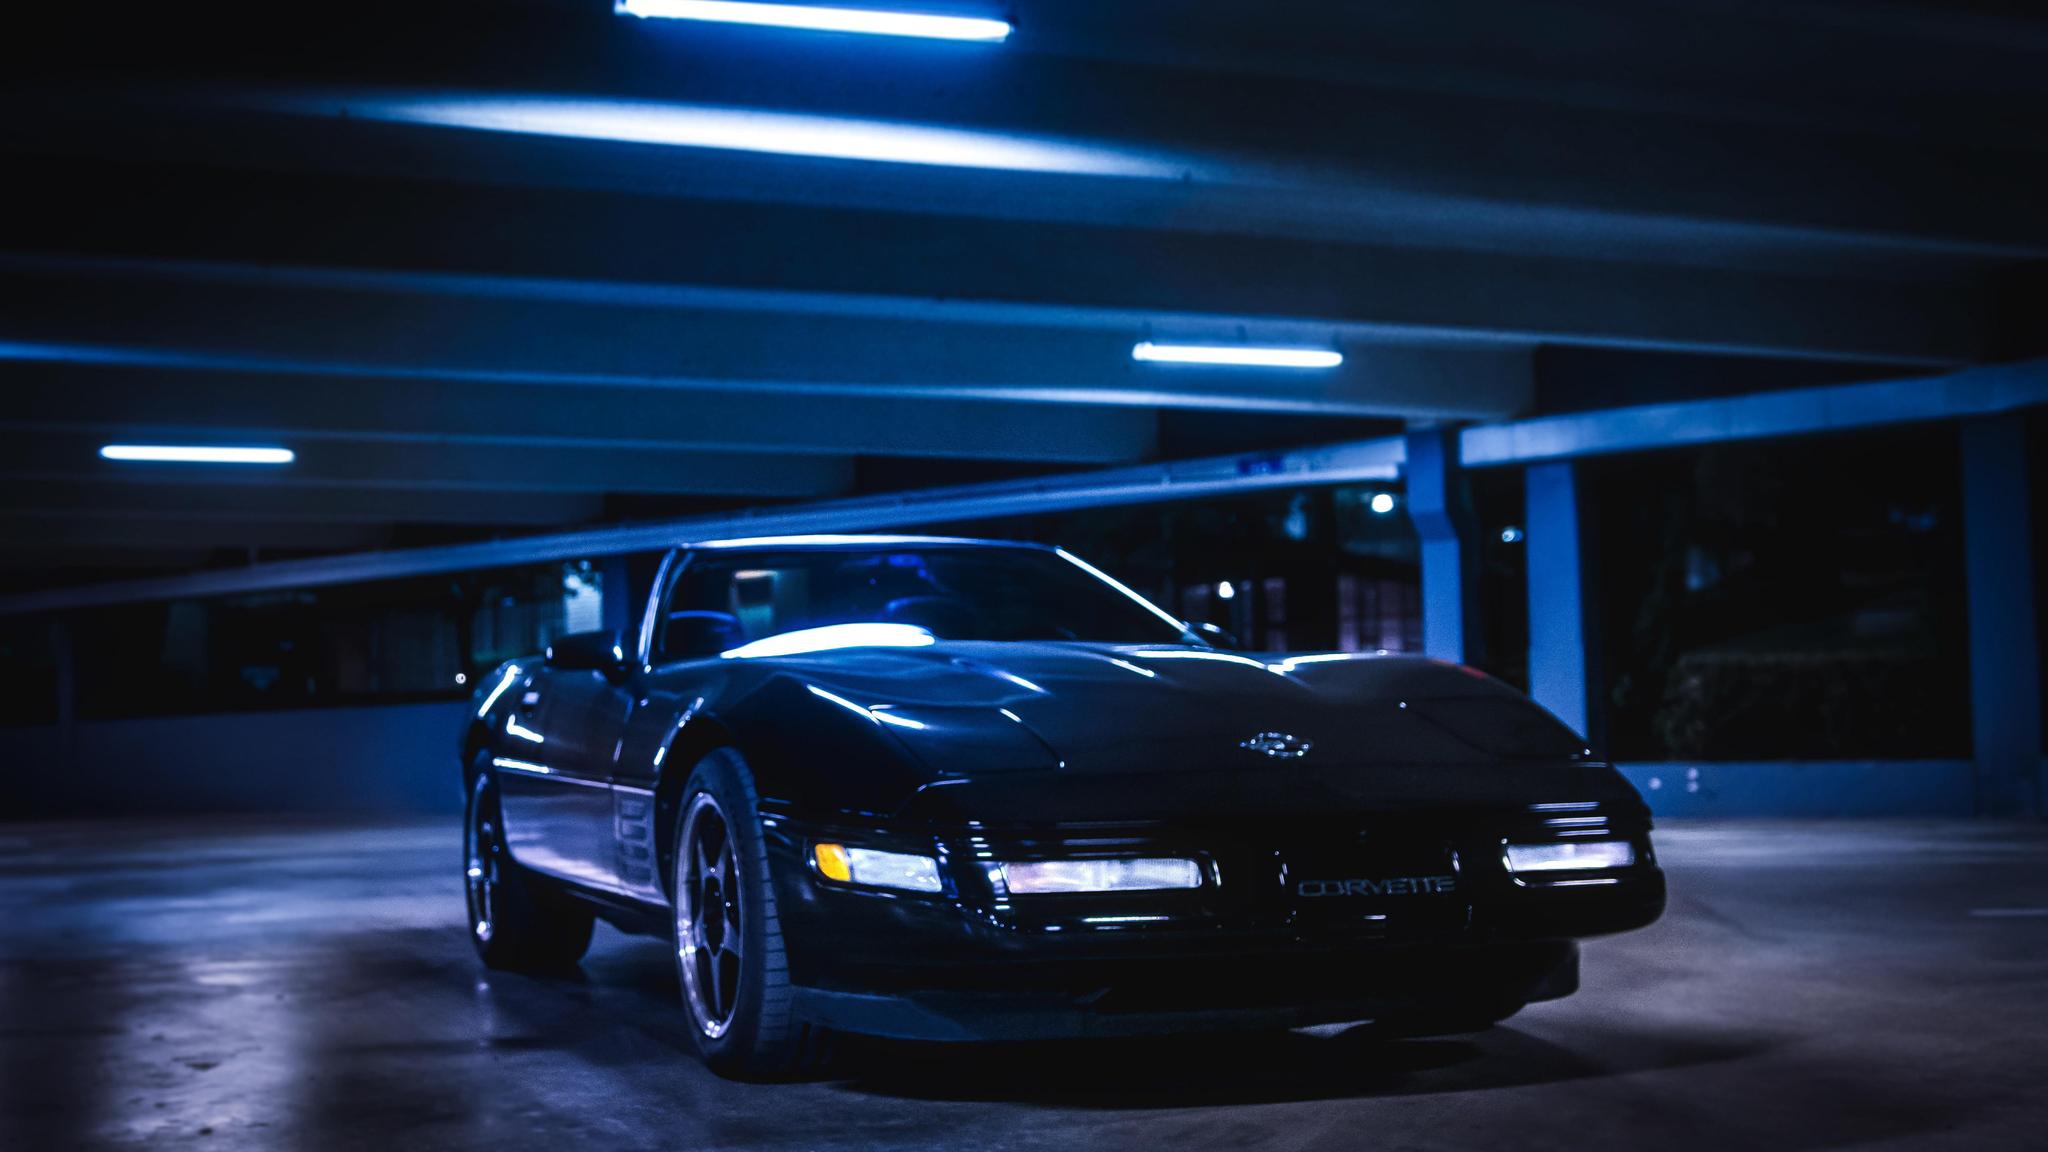 1993-corvette-parking-lot-5k-lo.jpg